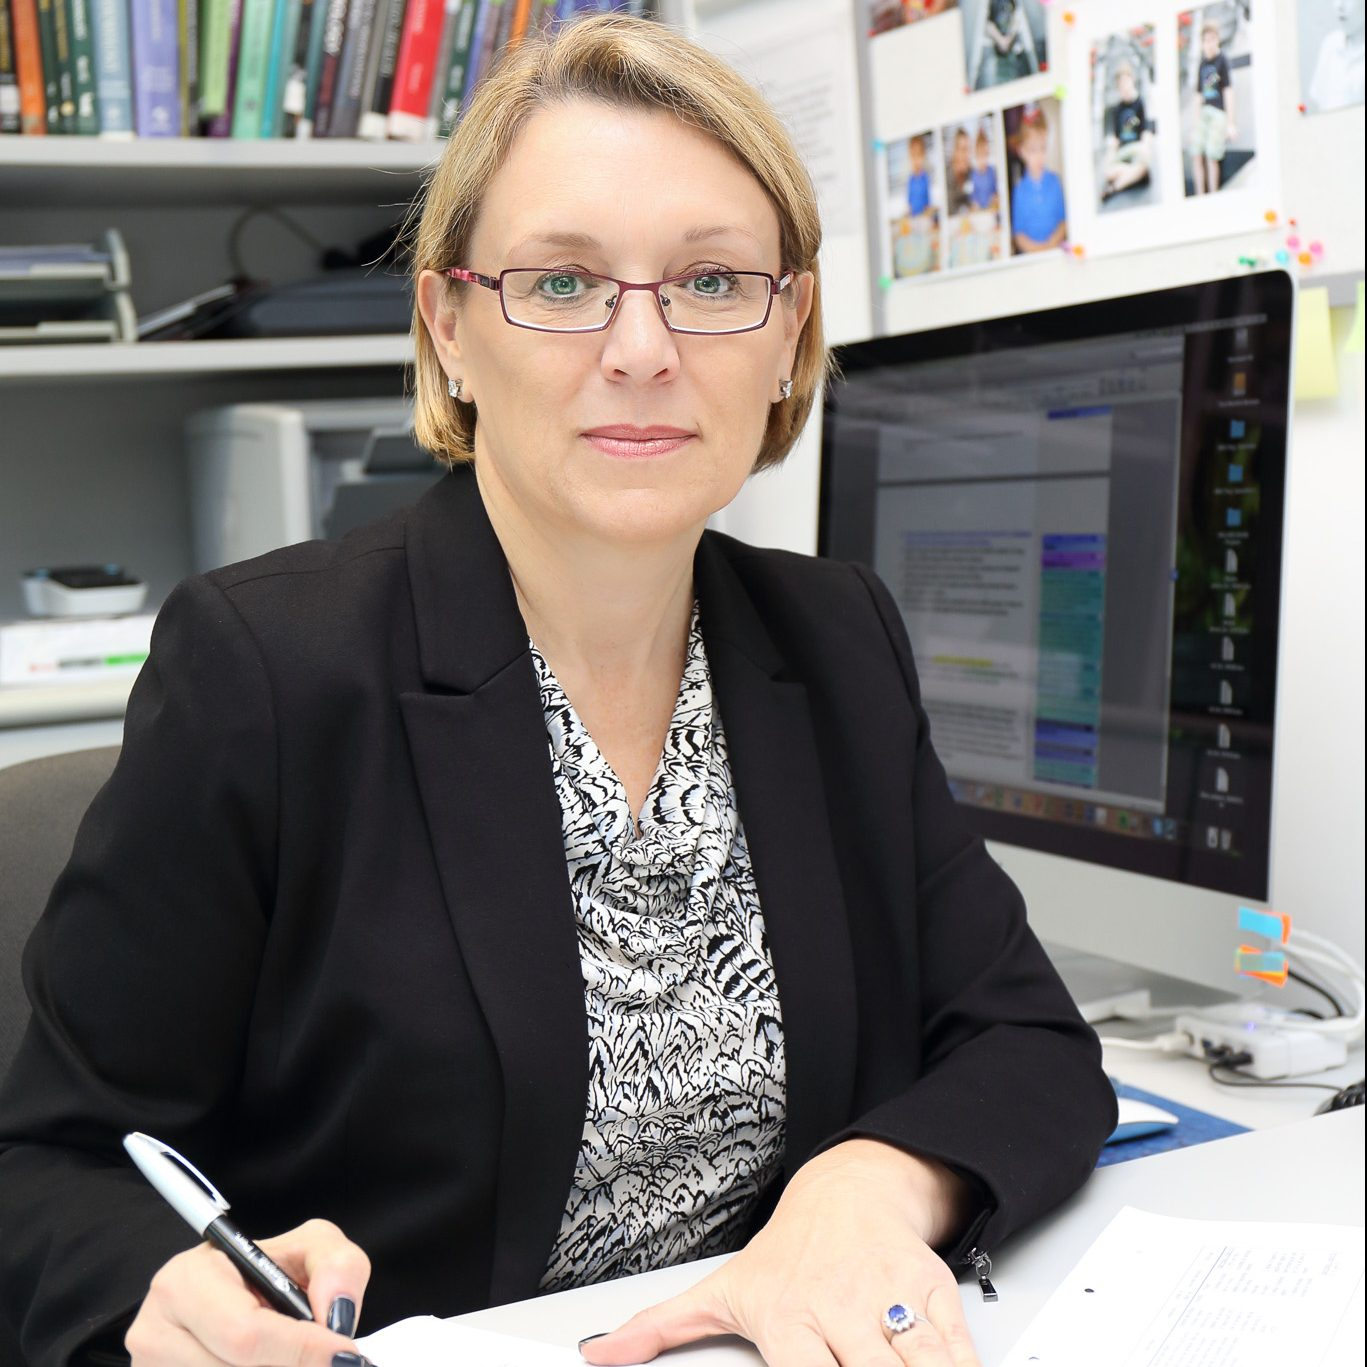 Static image of Nursing Director Marie Tarrant